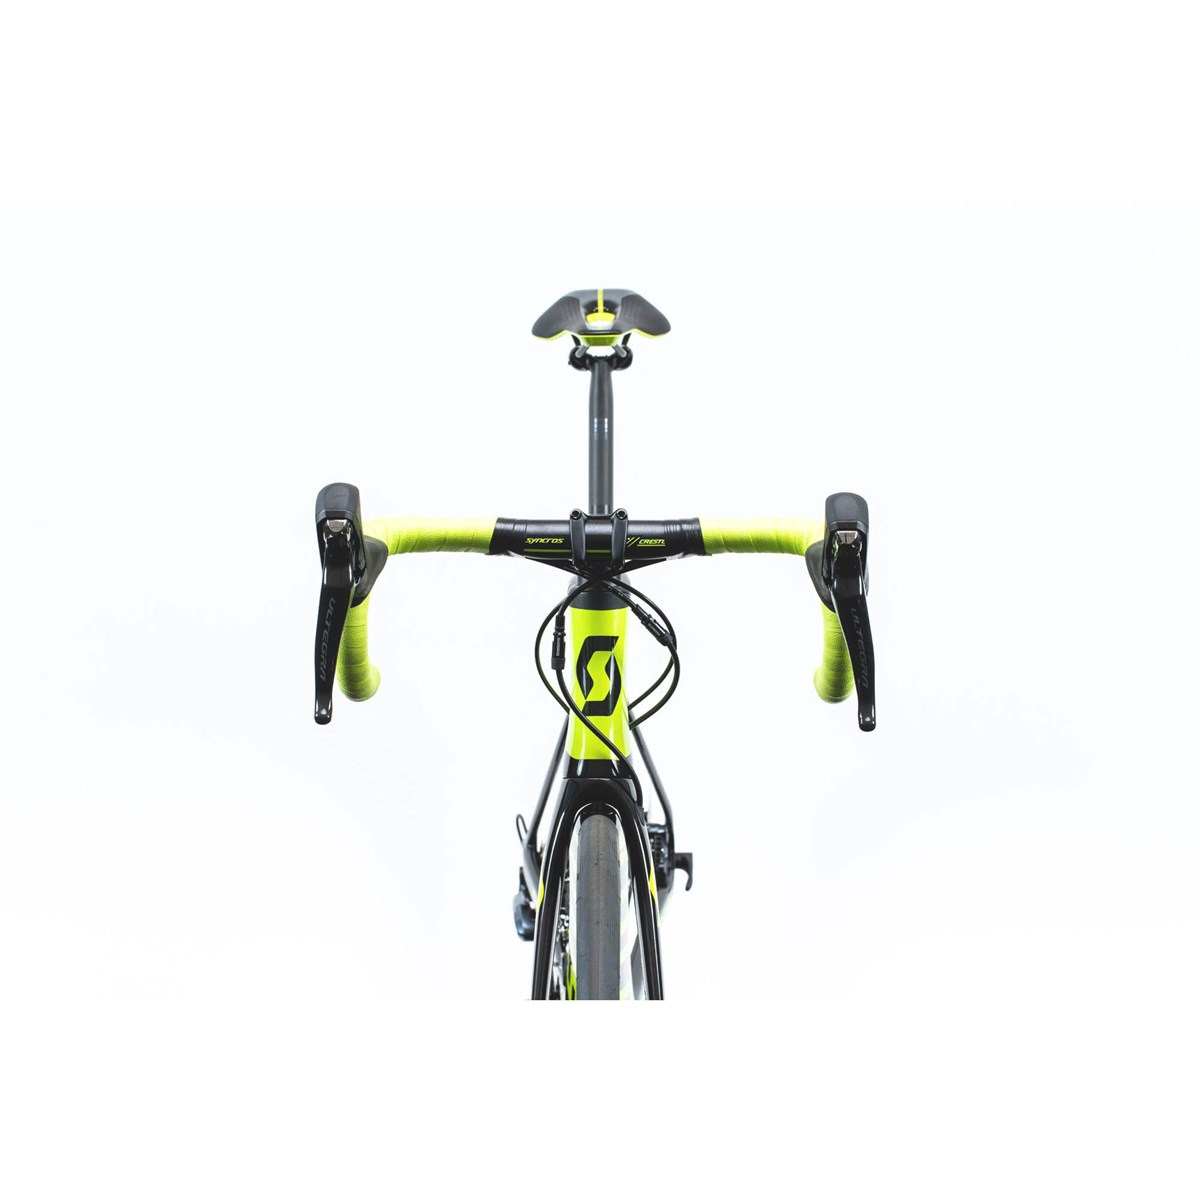 2019 Scott Foil 20 Disc Aero Carbon Road Bike 3 199 00